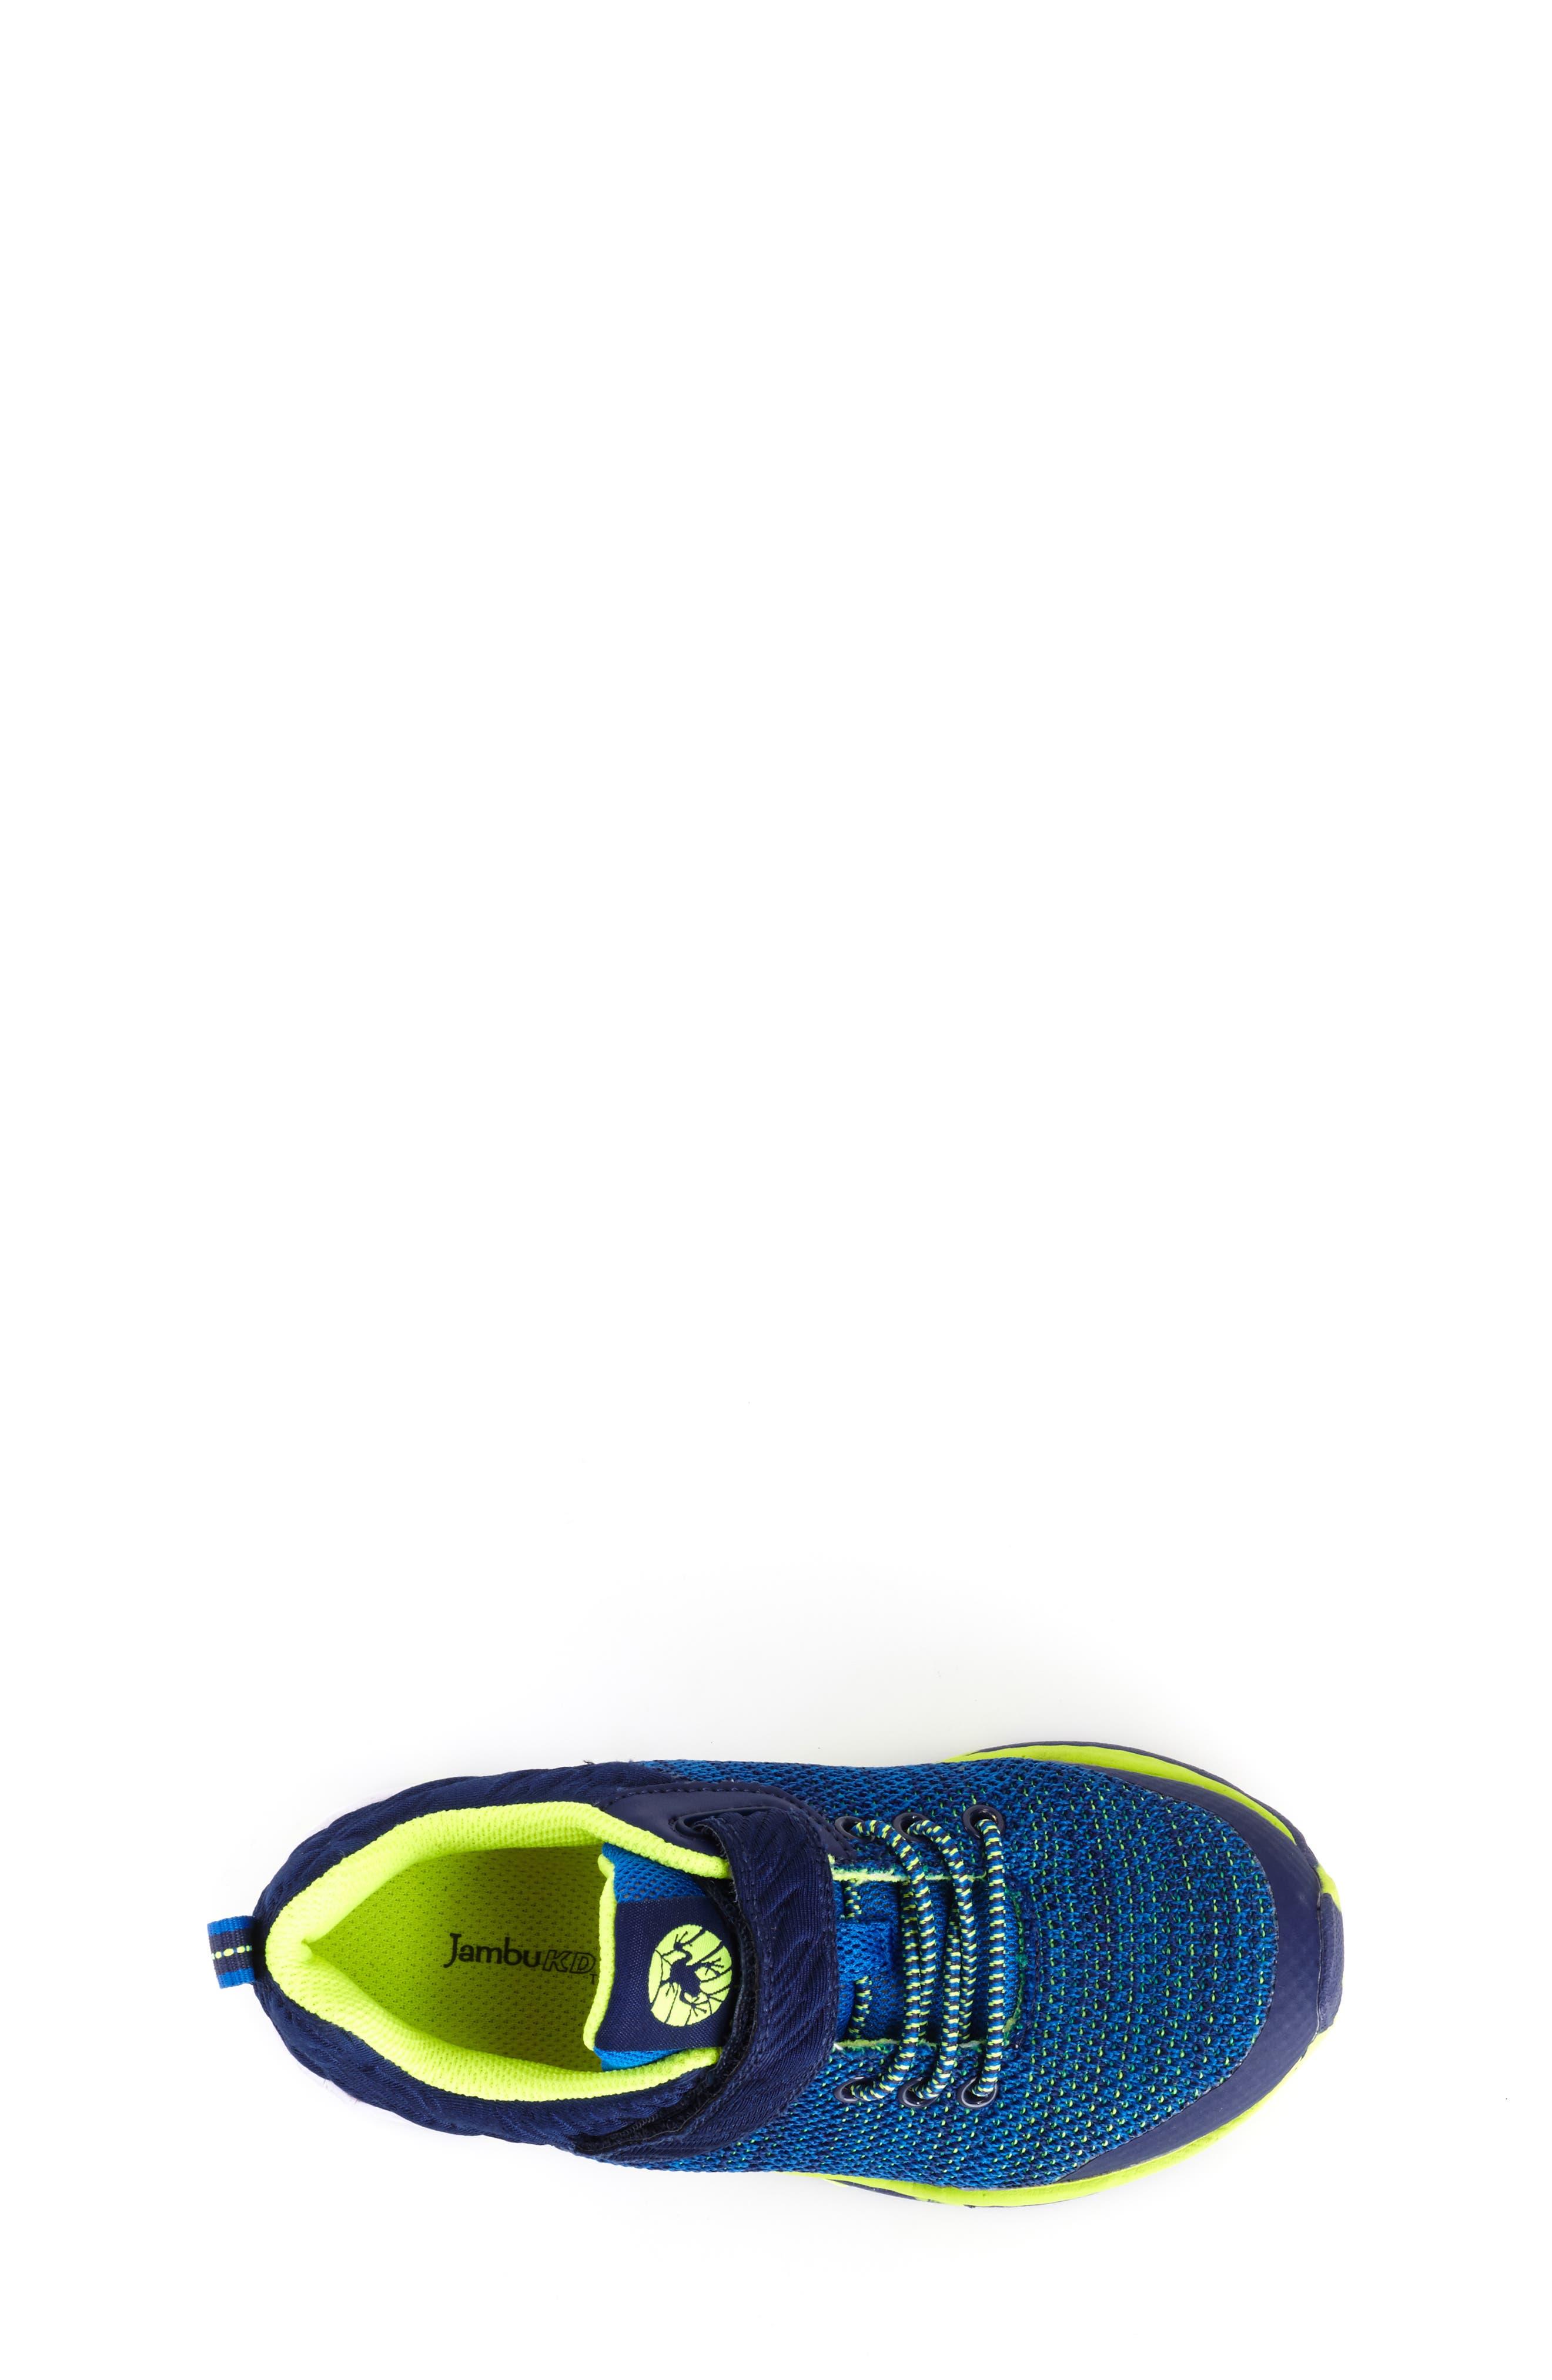 Talon Knit Sneaker,                             Alternate thumbnail 4, color,                             NAVY TEXTILE